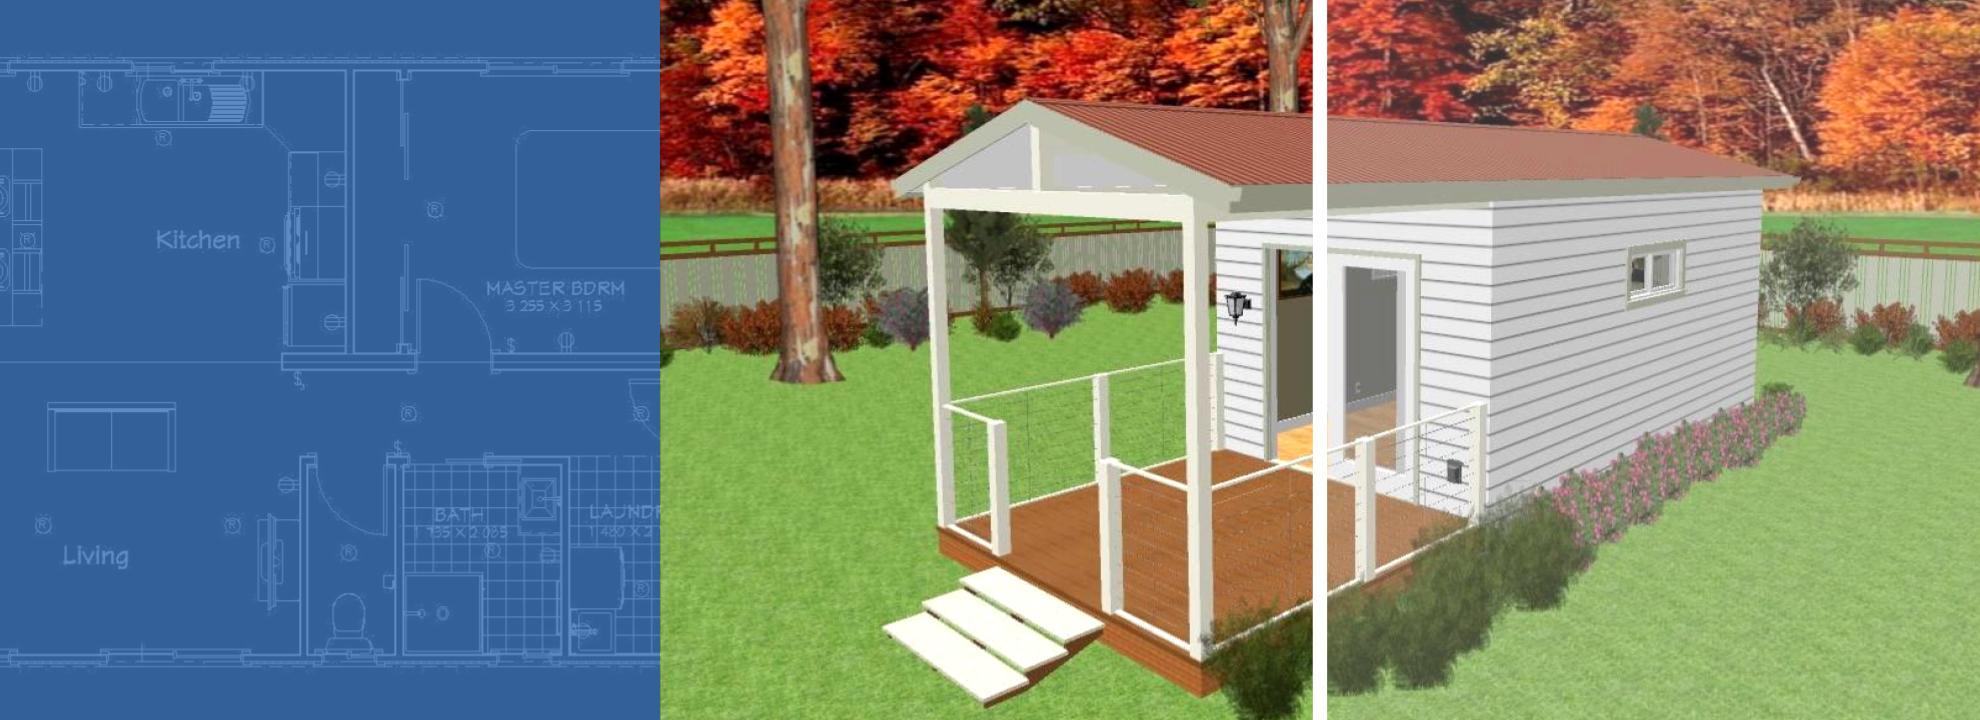 6x3 portable building granny flat tiny house